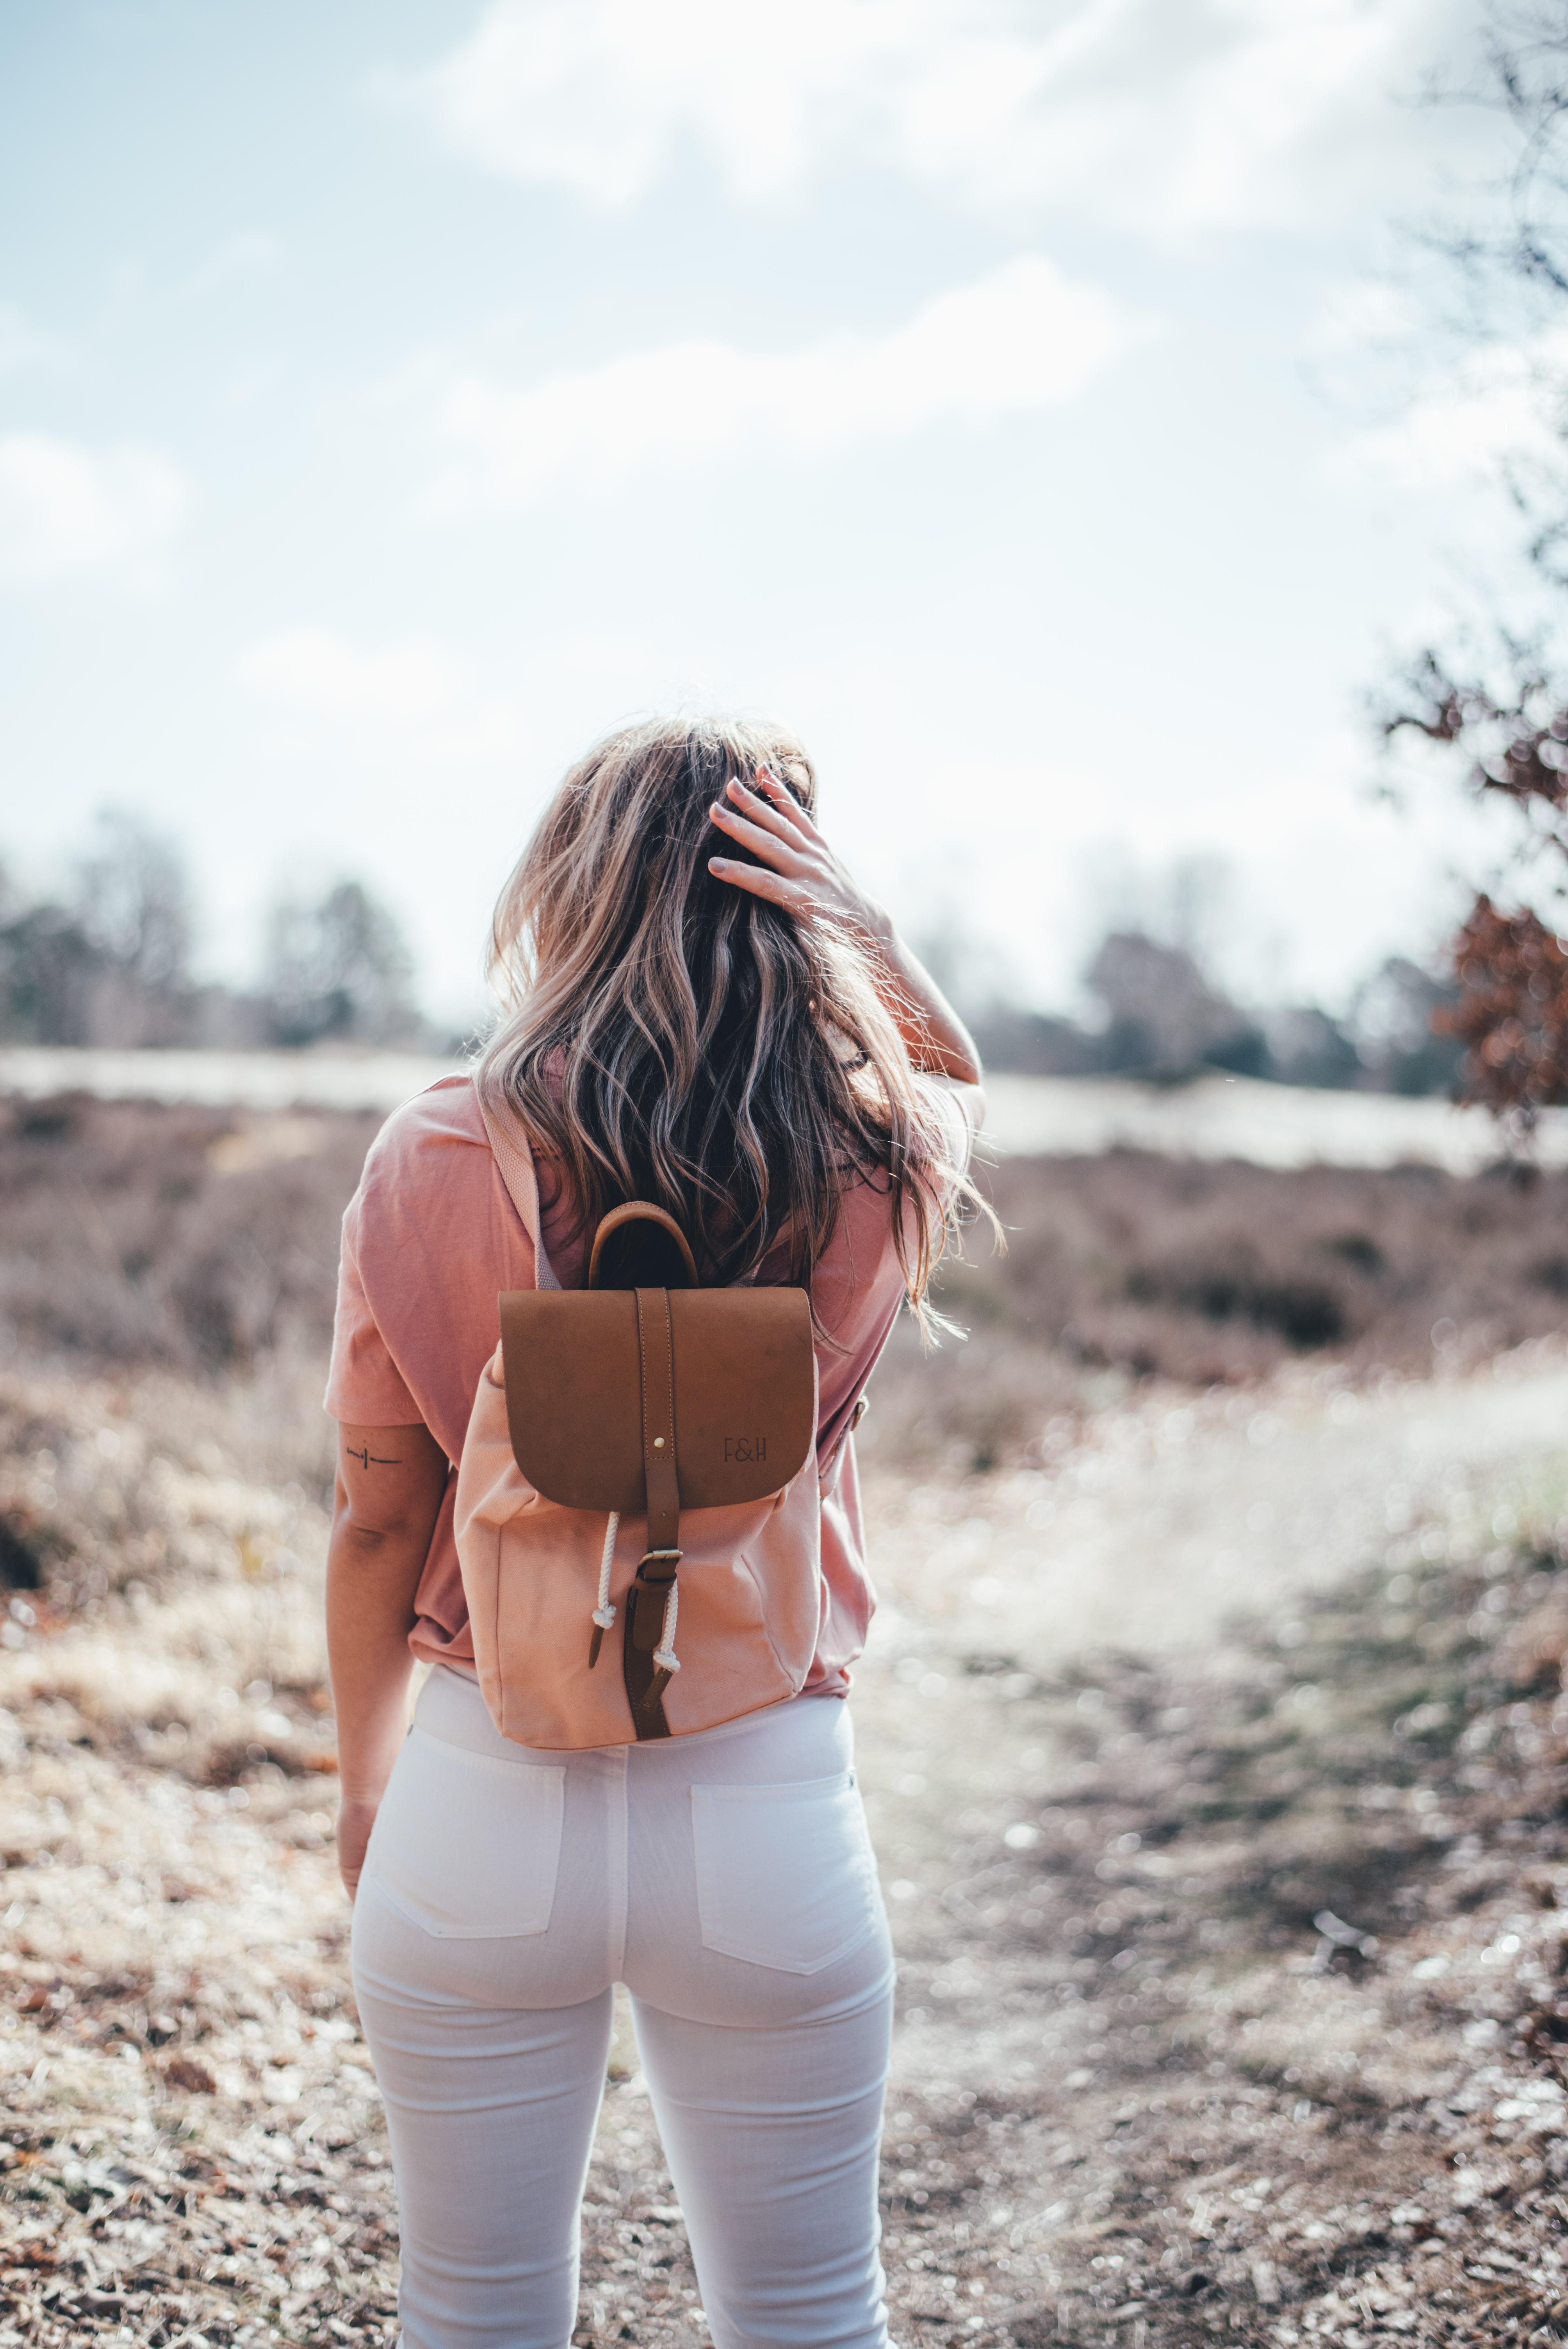 fitz and huxley, backpack, rugzak, rugtas, roze, cognac, ootd, bag, tas, influencer, xmariekie, social media, blog, blogger